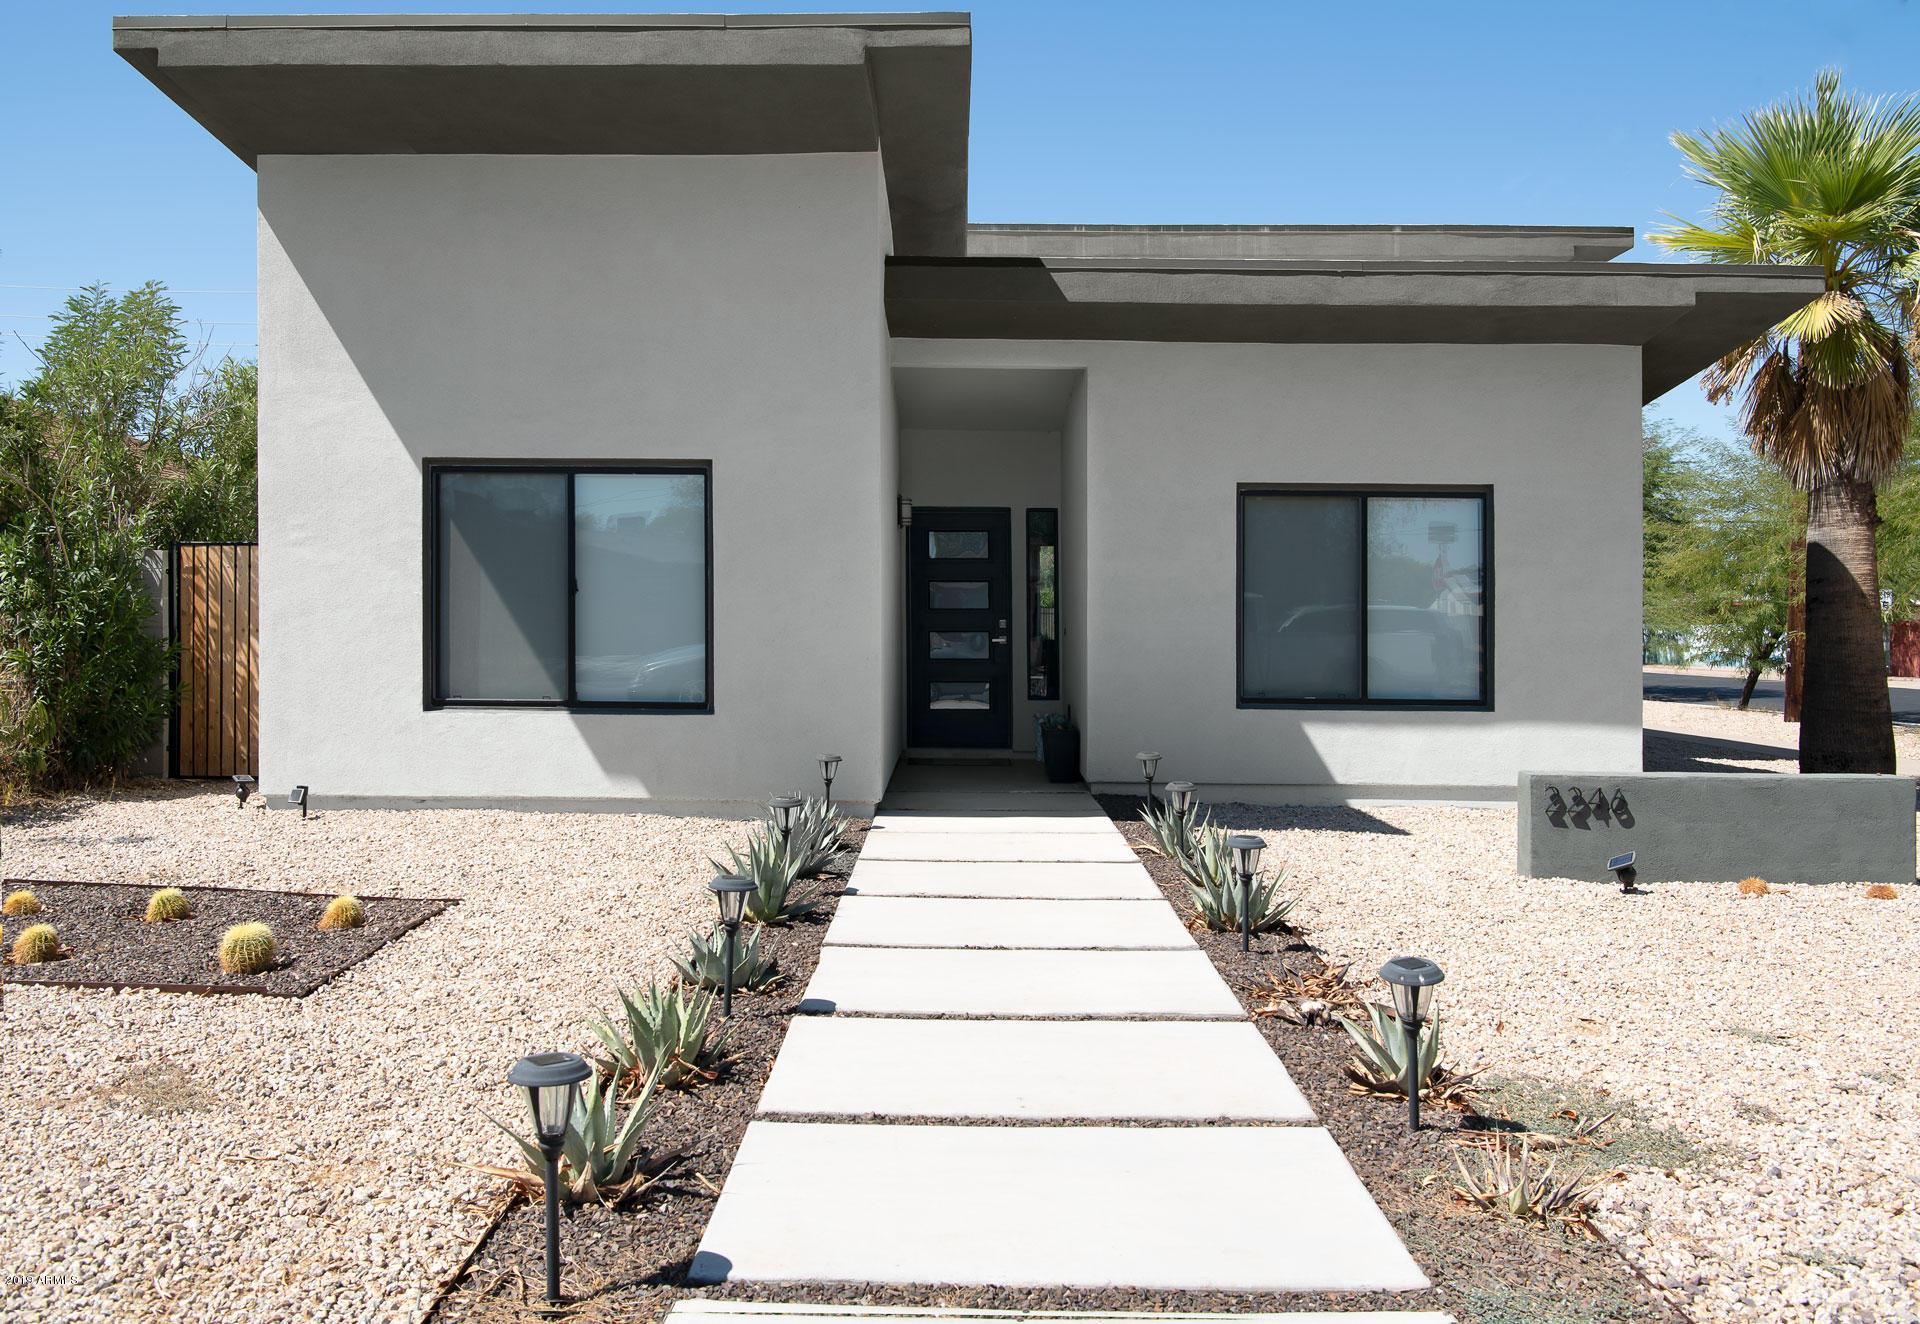 MLS 6005644 2246 N 10TH Street, Phoenix, AZ 85006 Newer Homes in Phoenix